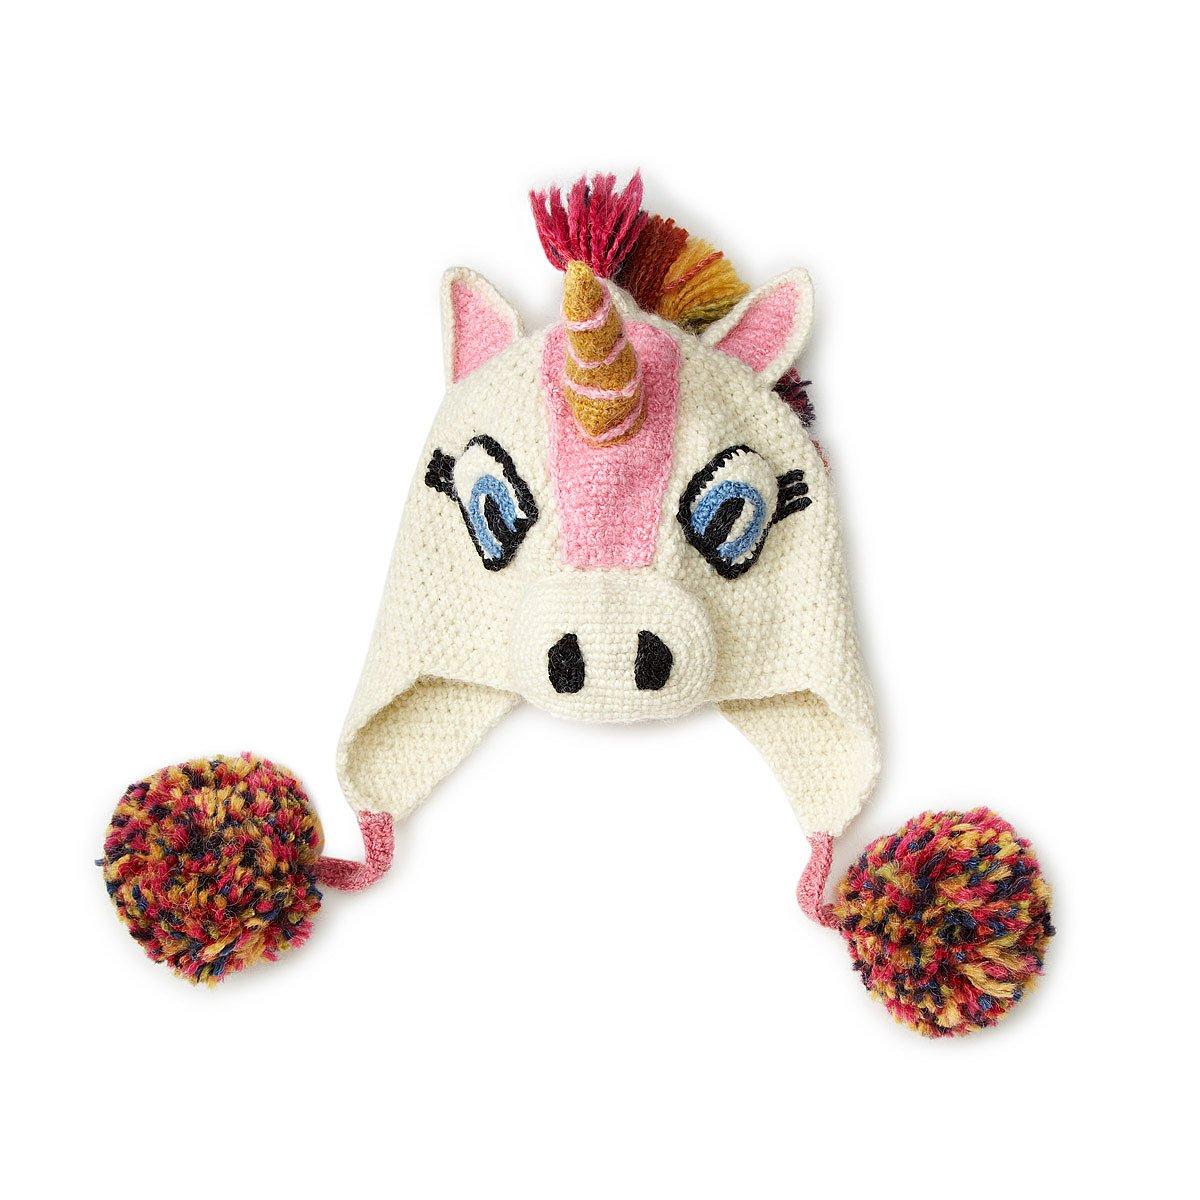 Crochet Unicorn Hat : Hand Crocheted Unicorn Hat Winter Hat With Ear Flaps UncommonGoods